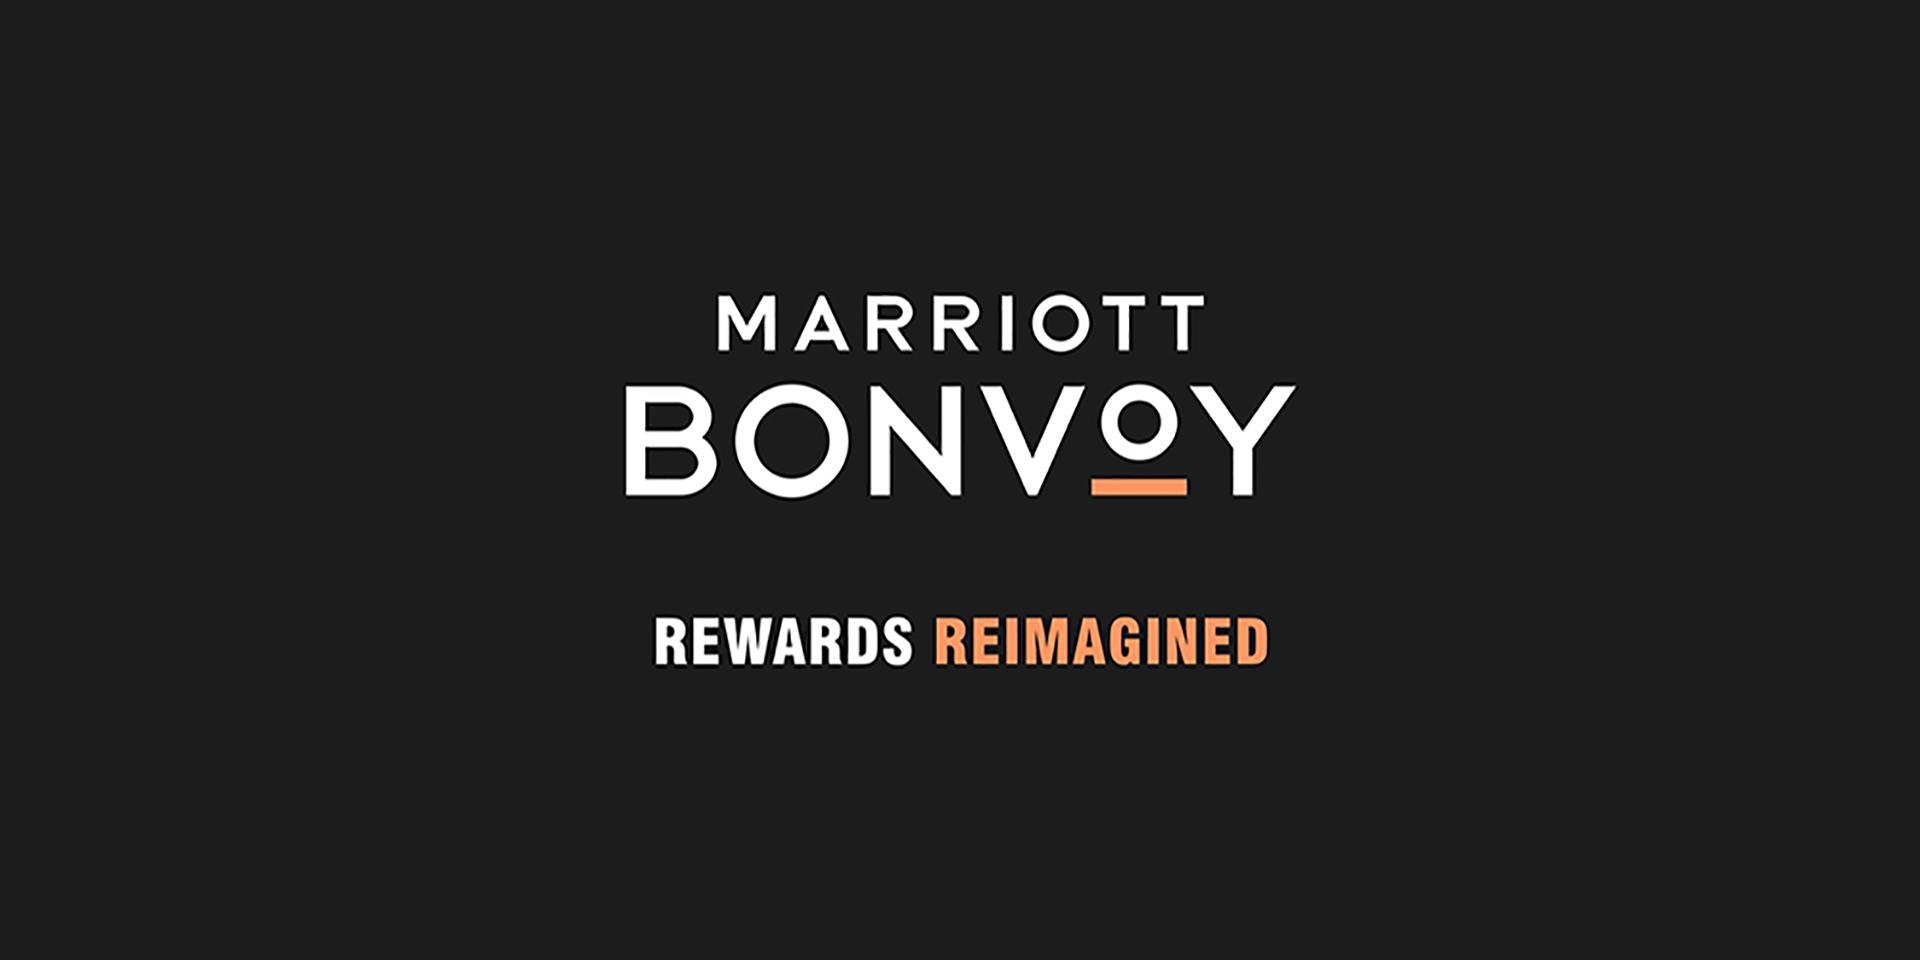 Marriott Bonvoy Kicks Off Global Marketing Campaign To Introduce